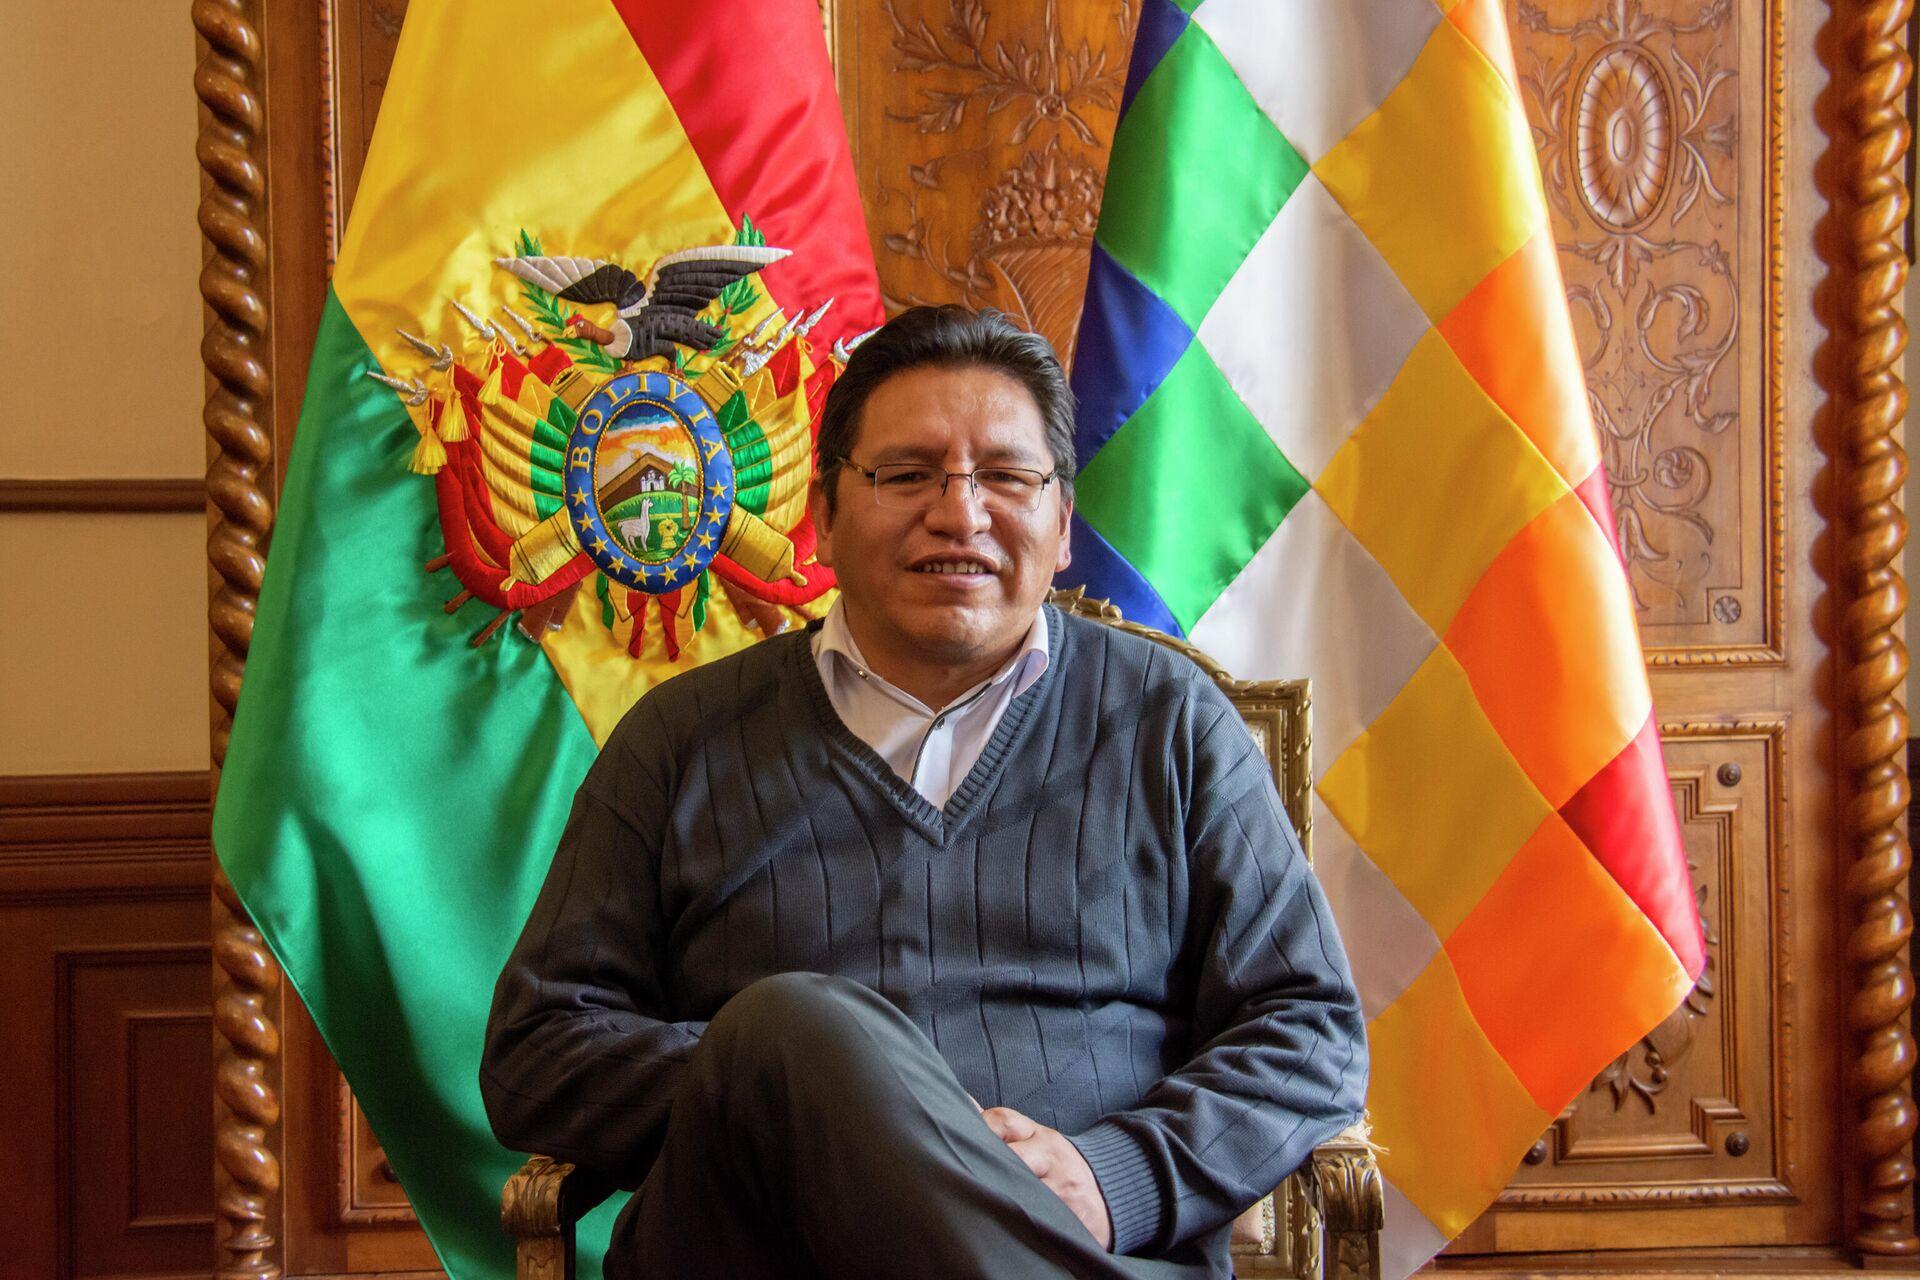 Vicecanciller de Bolivia, Freddy Mamani - Sputnik Mundo, 1920, 17.08.2021